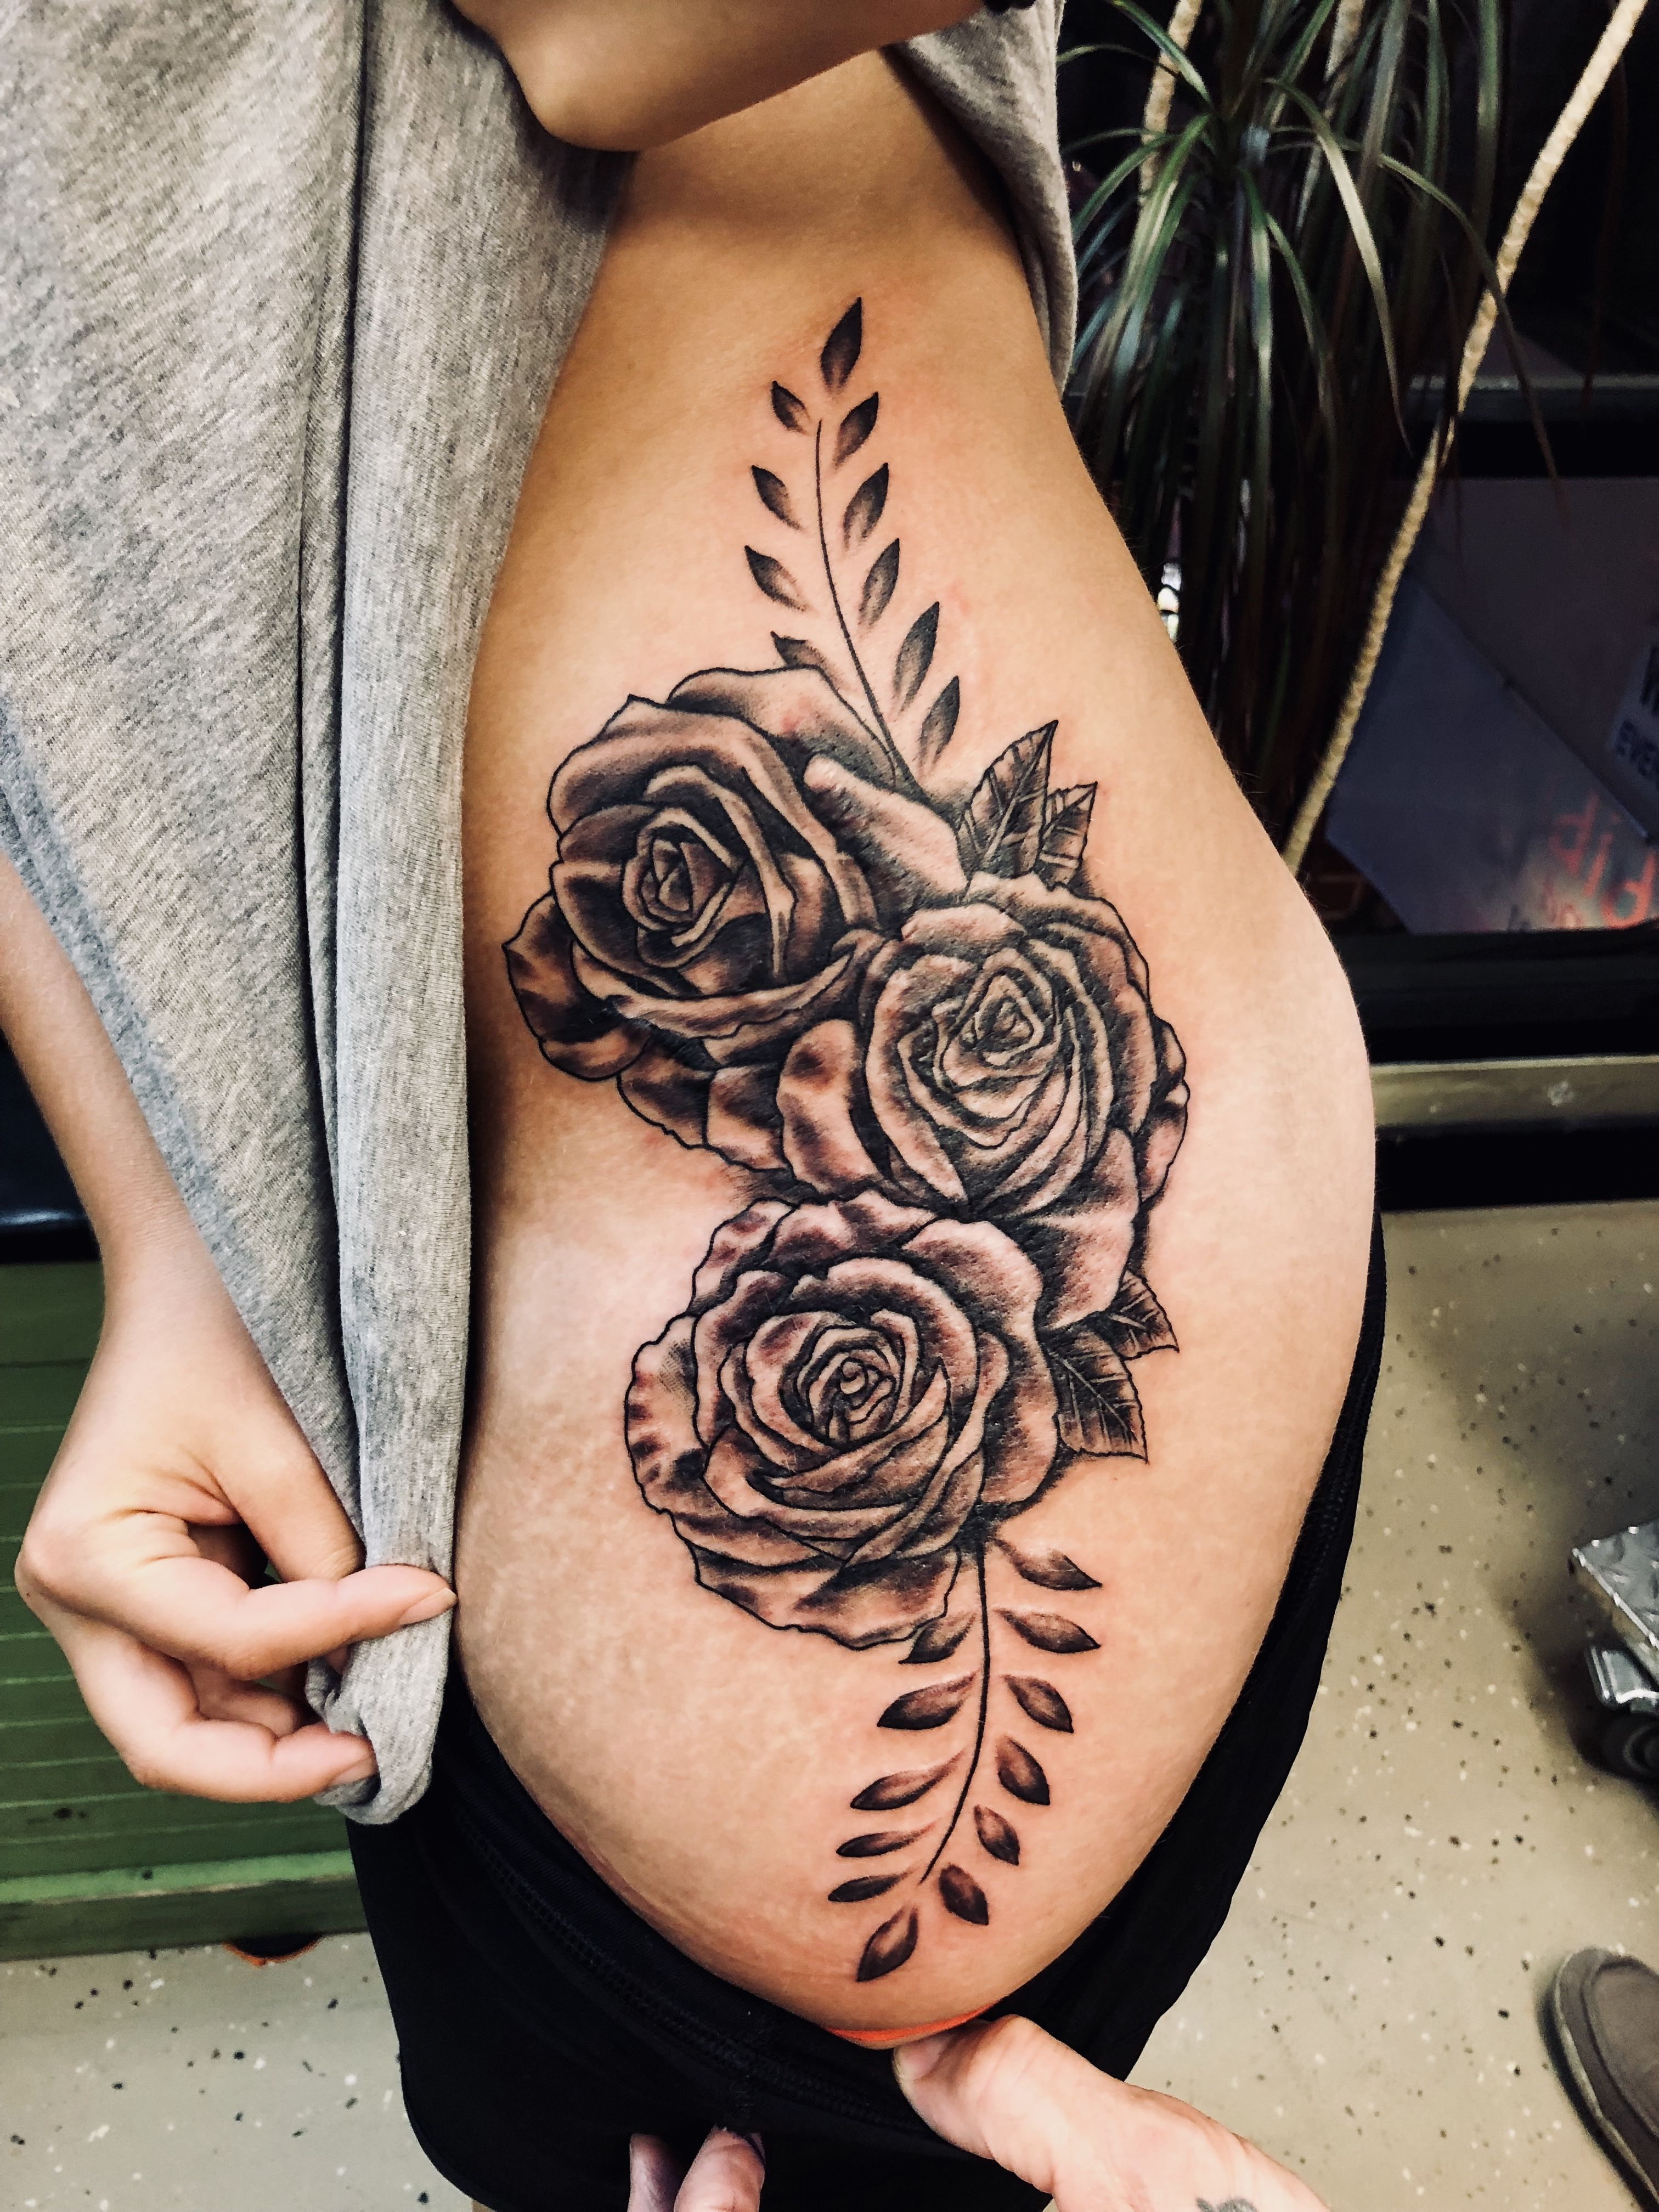 Rose Tattoo Tattoos For Women Thigh Tattoo Hip Tattoo Rose Thigh Tattoo Roses Tattoo Tattoos For Women Thigh Tattoo Thigh Tattoos Women